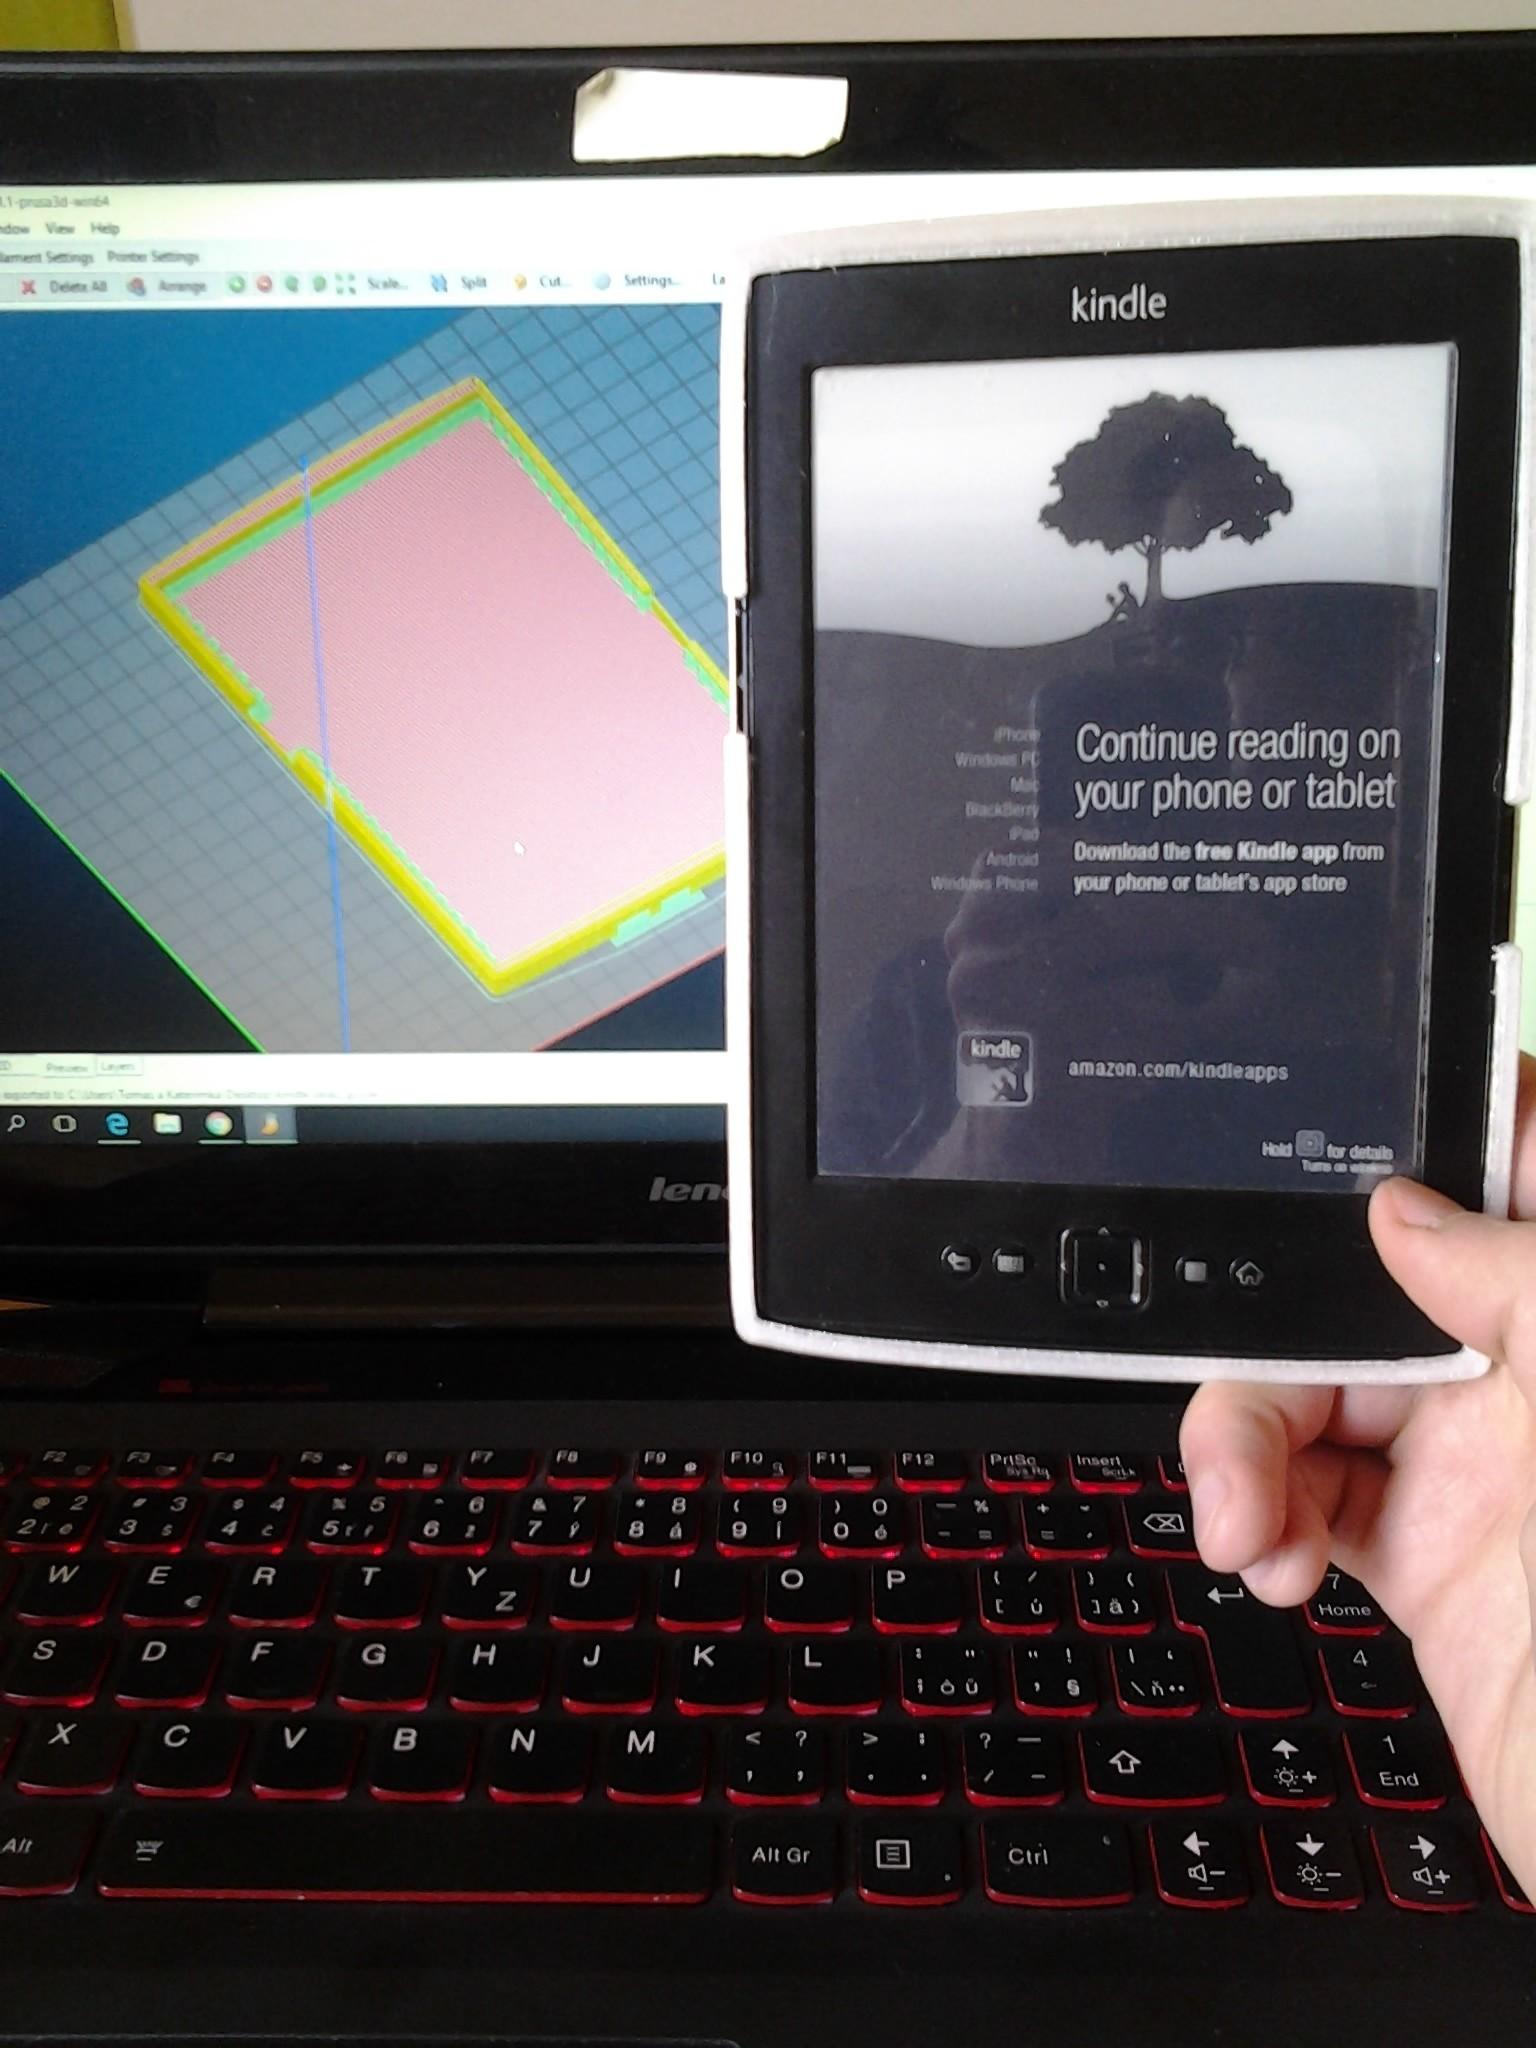 2017-05-18 09.45.39.jpg Download STL file kindle casing • 3D printing template, Amador